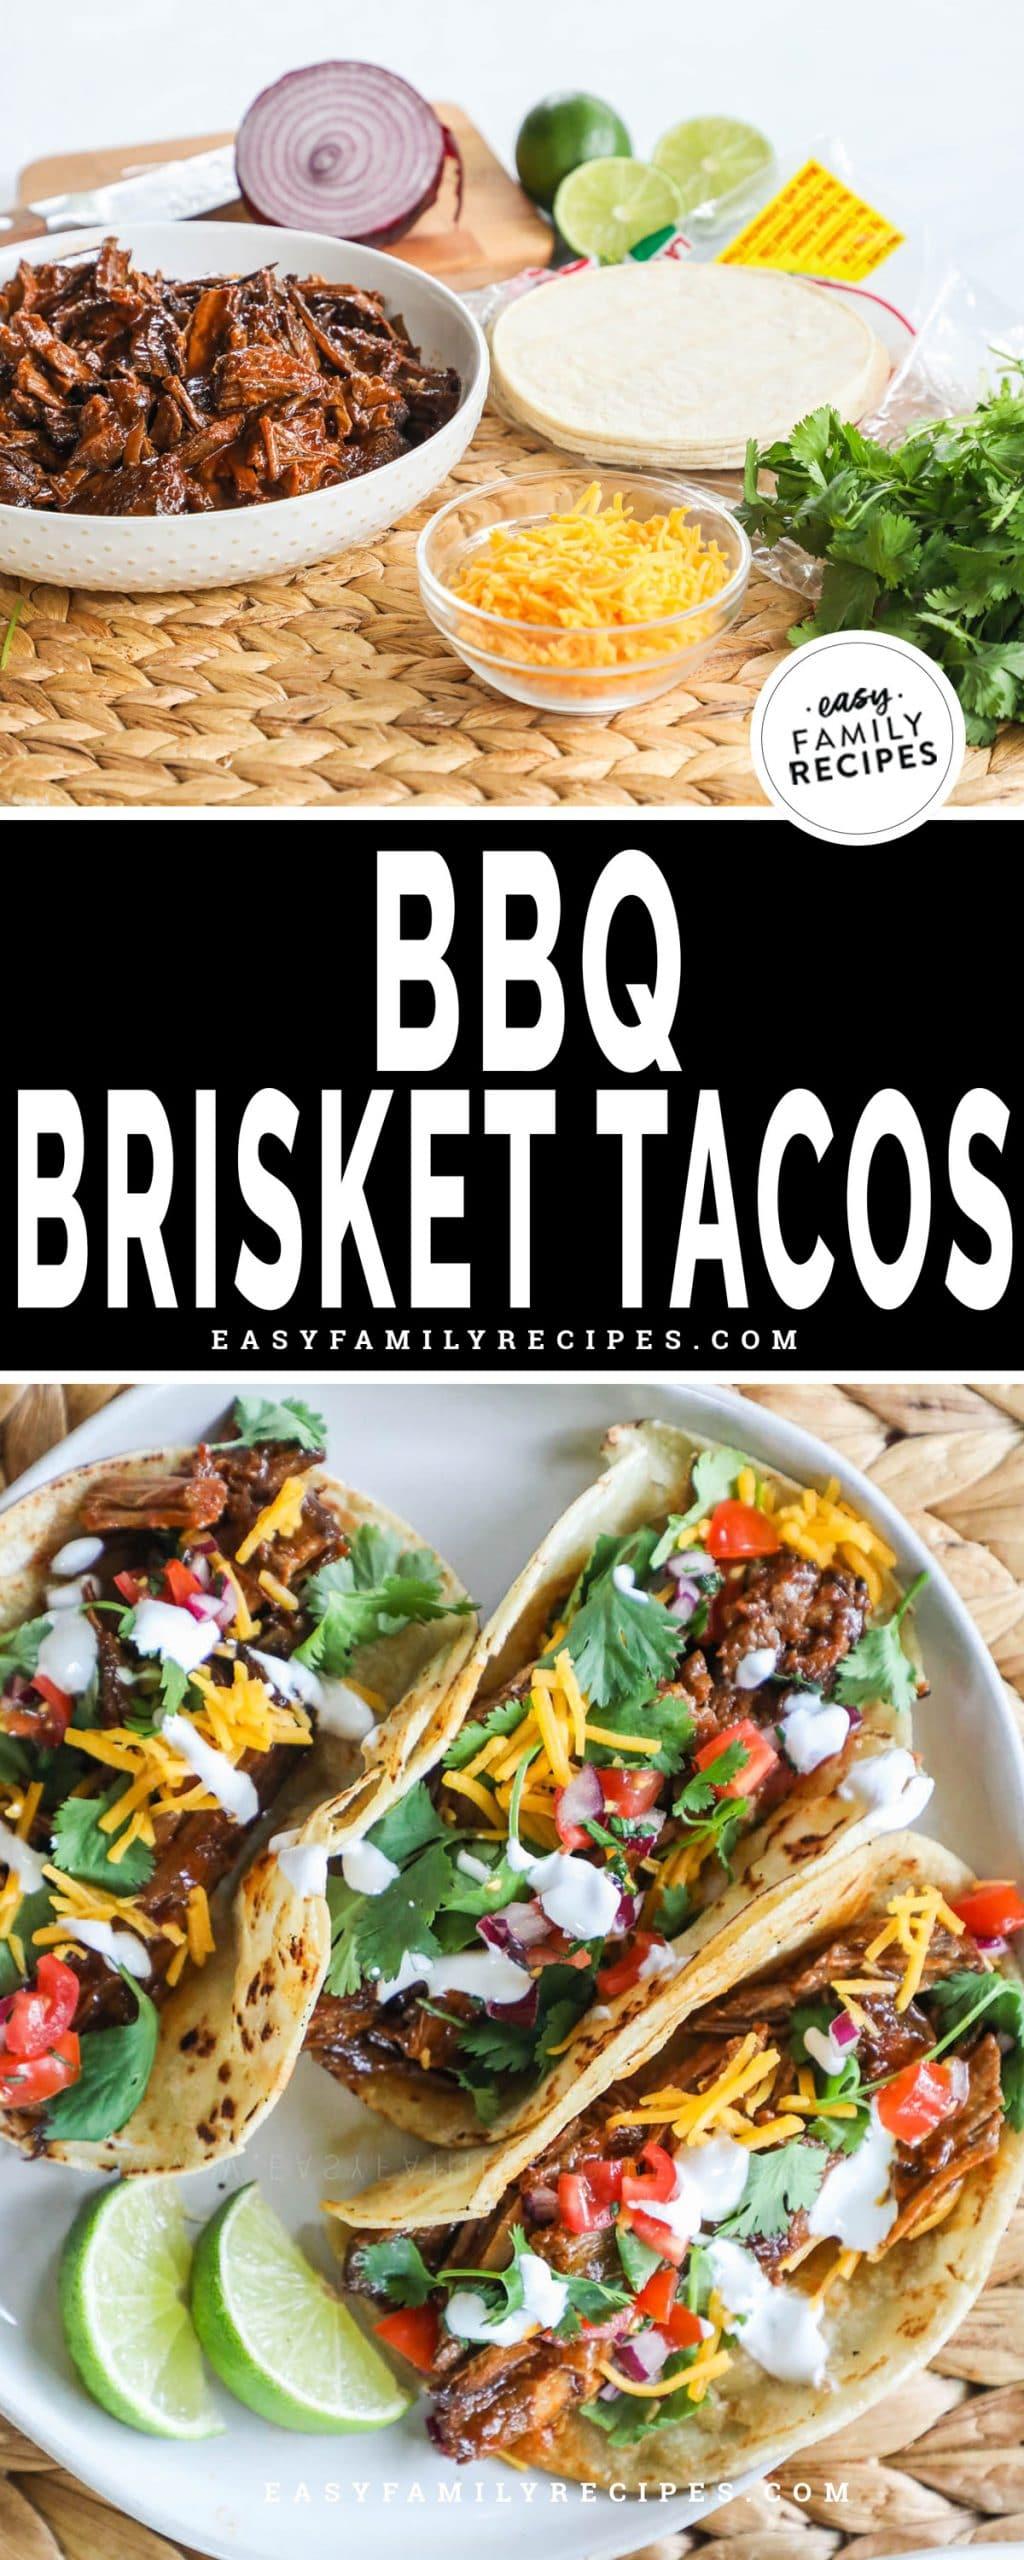 Ingredients gathered for making brisket tacos top. BBQ Brisket tacos assembled on plate bottom.